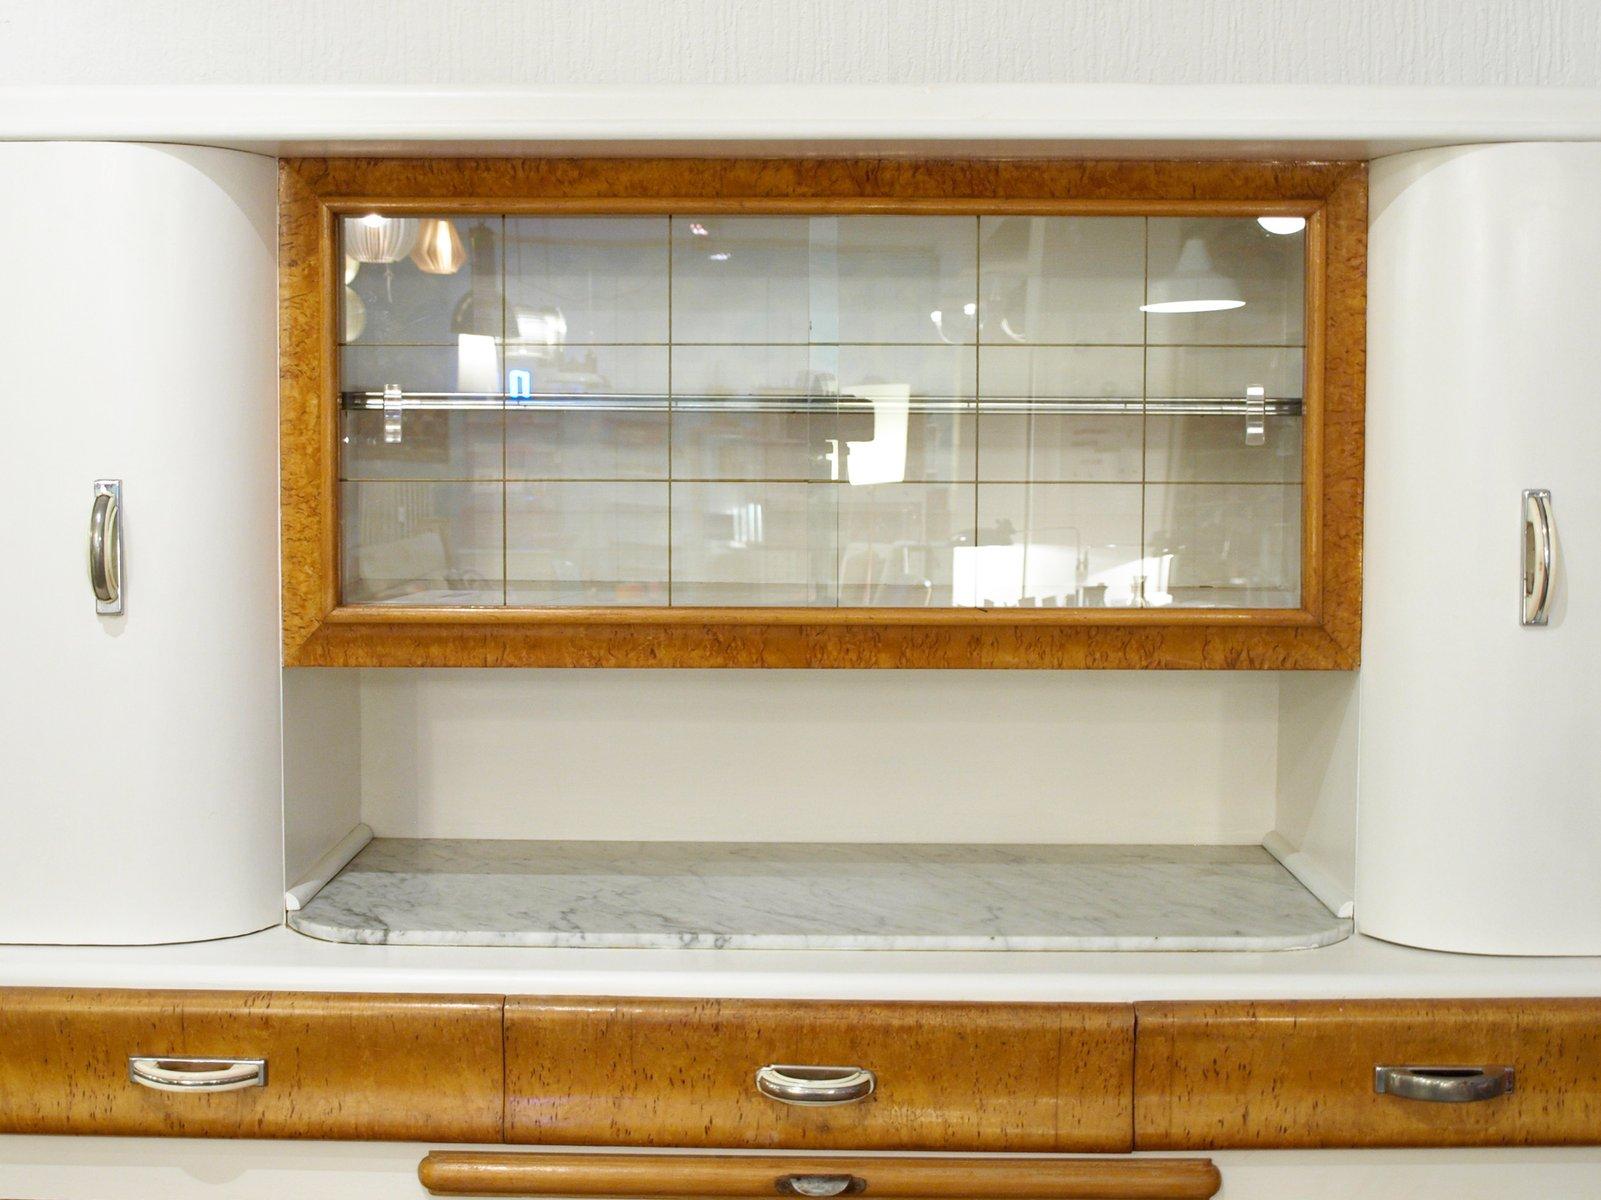 Kitchen cabinet from k nig qualit tsk chen 1950s for sale for 1950s kitchen cabinets for sale